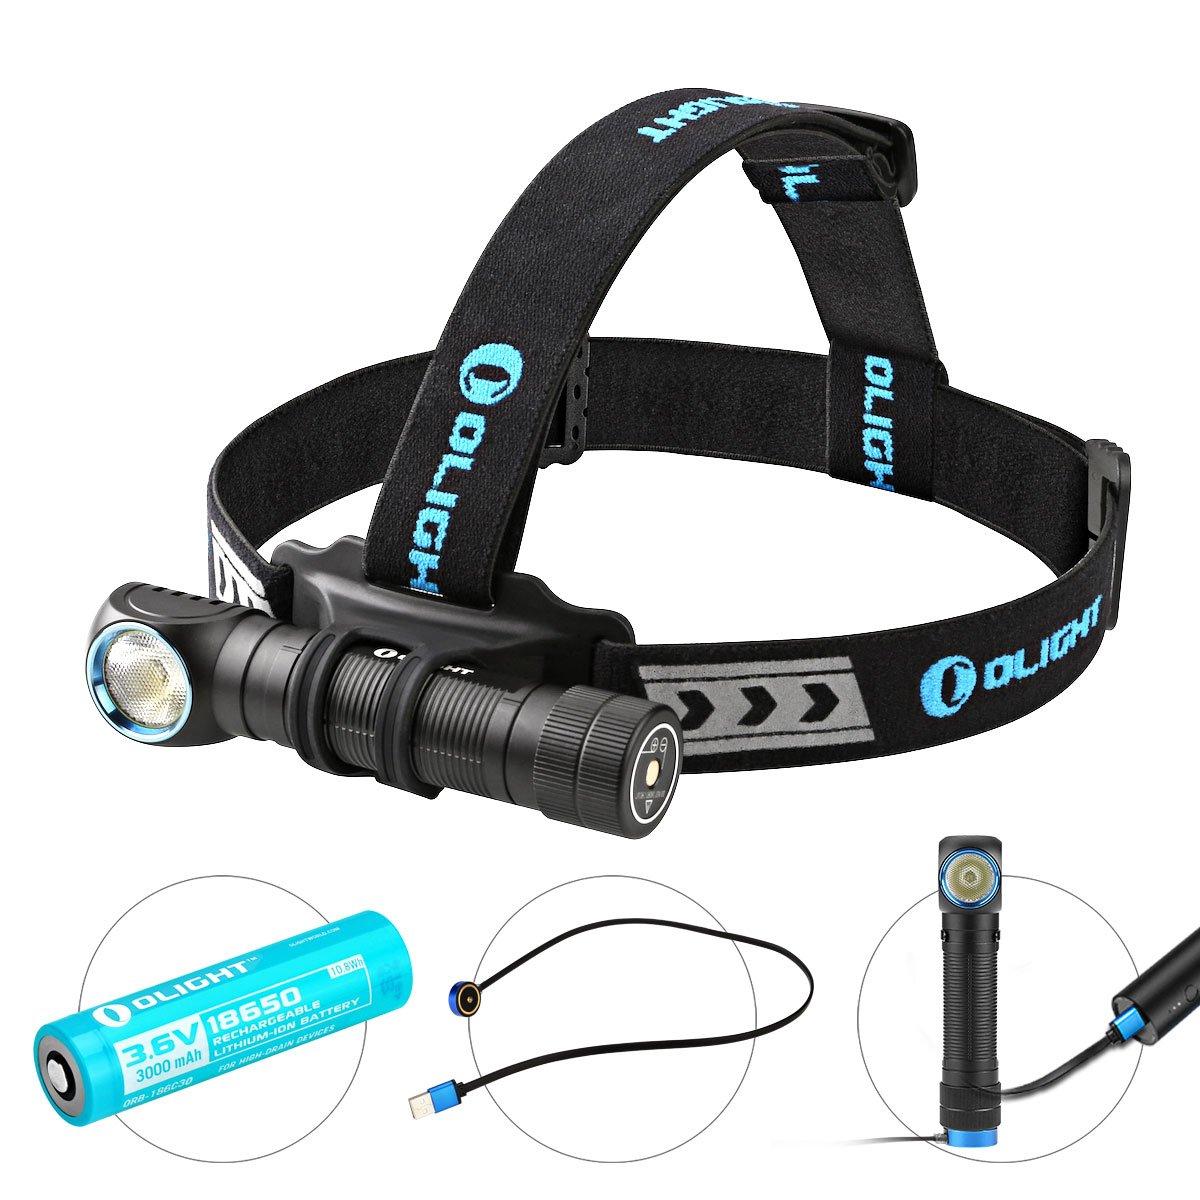 Olight® H2R Nova Stirnlampe Taschenlampe Multifunktionslampe aufladbar mit CREE XHP50 LED Max 2300 Lumen,1 x 18650 3000mAh Akku, Kaltweiß